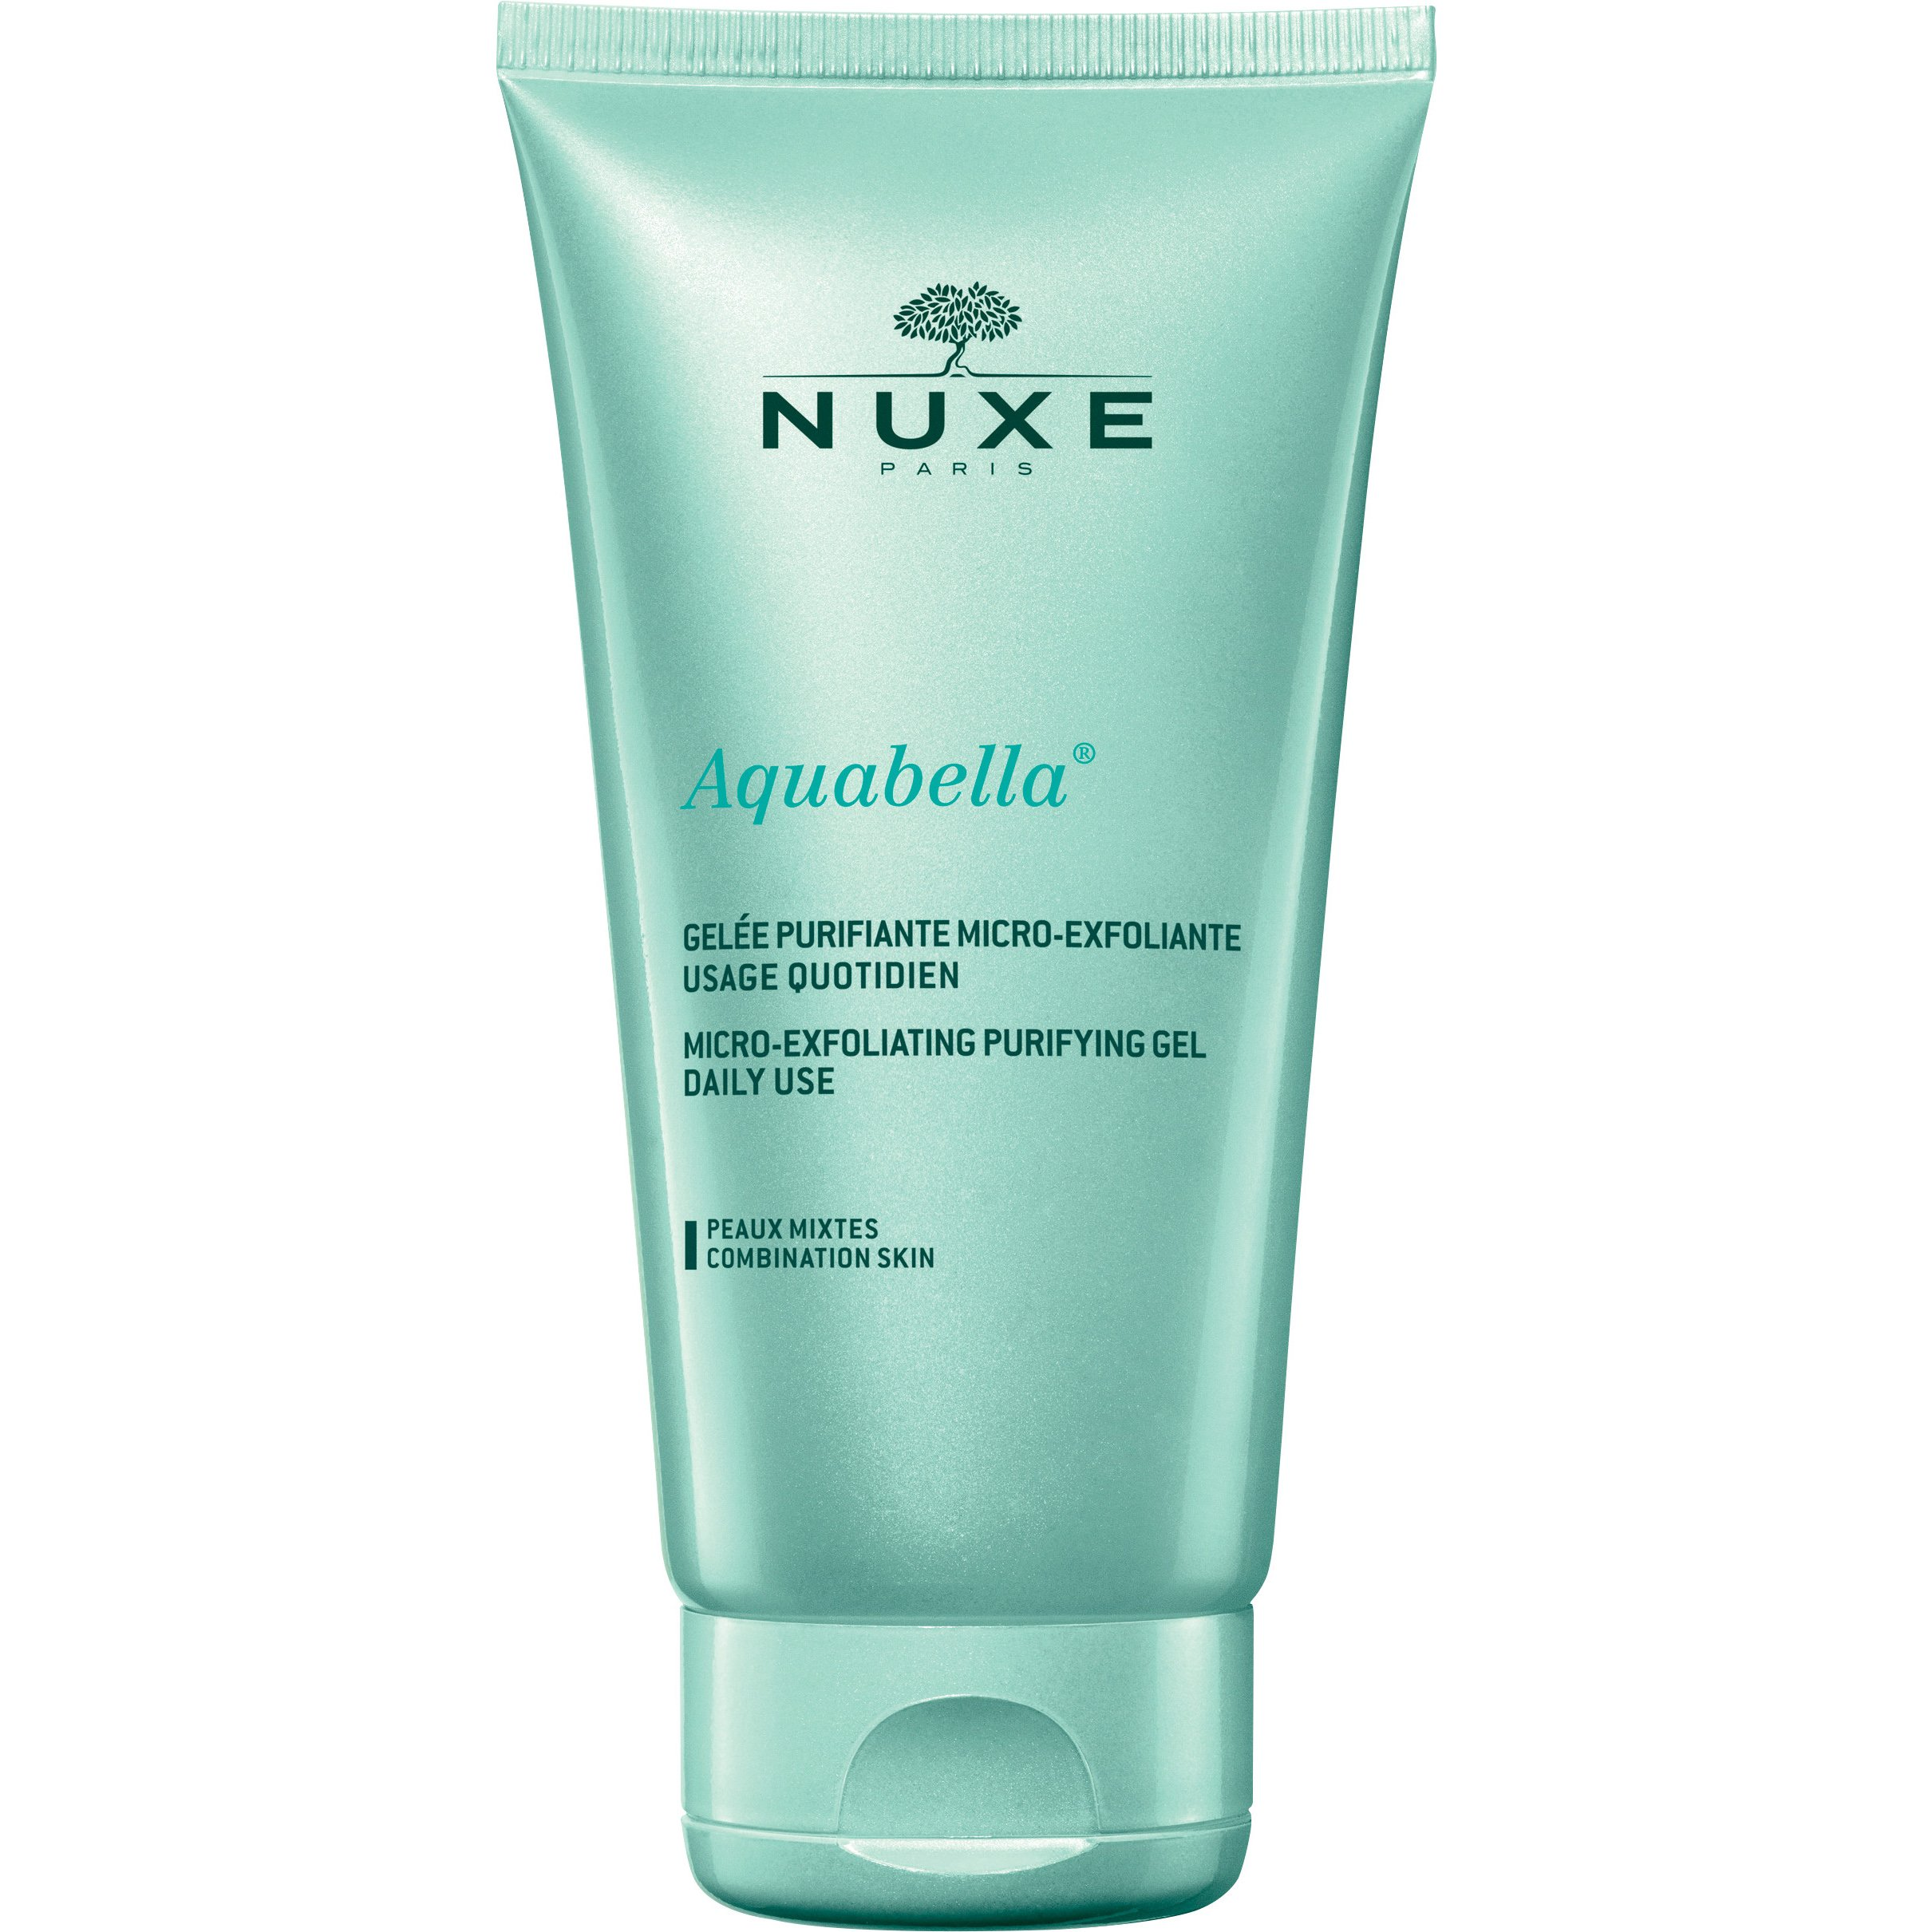 Nuxe Aquabella Micro-Exfoliating Purifying Gel Καθημερινός Καθαρισμός & Απολέπιση Προσώπου, Κανονικές – Μικτές Επιδερμίδες 150ml